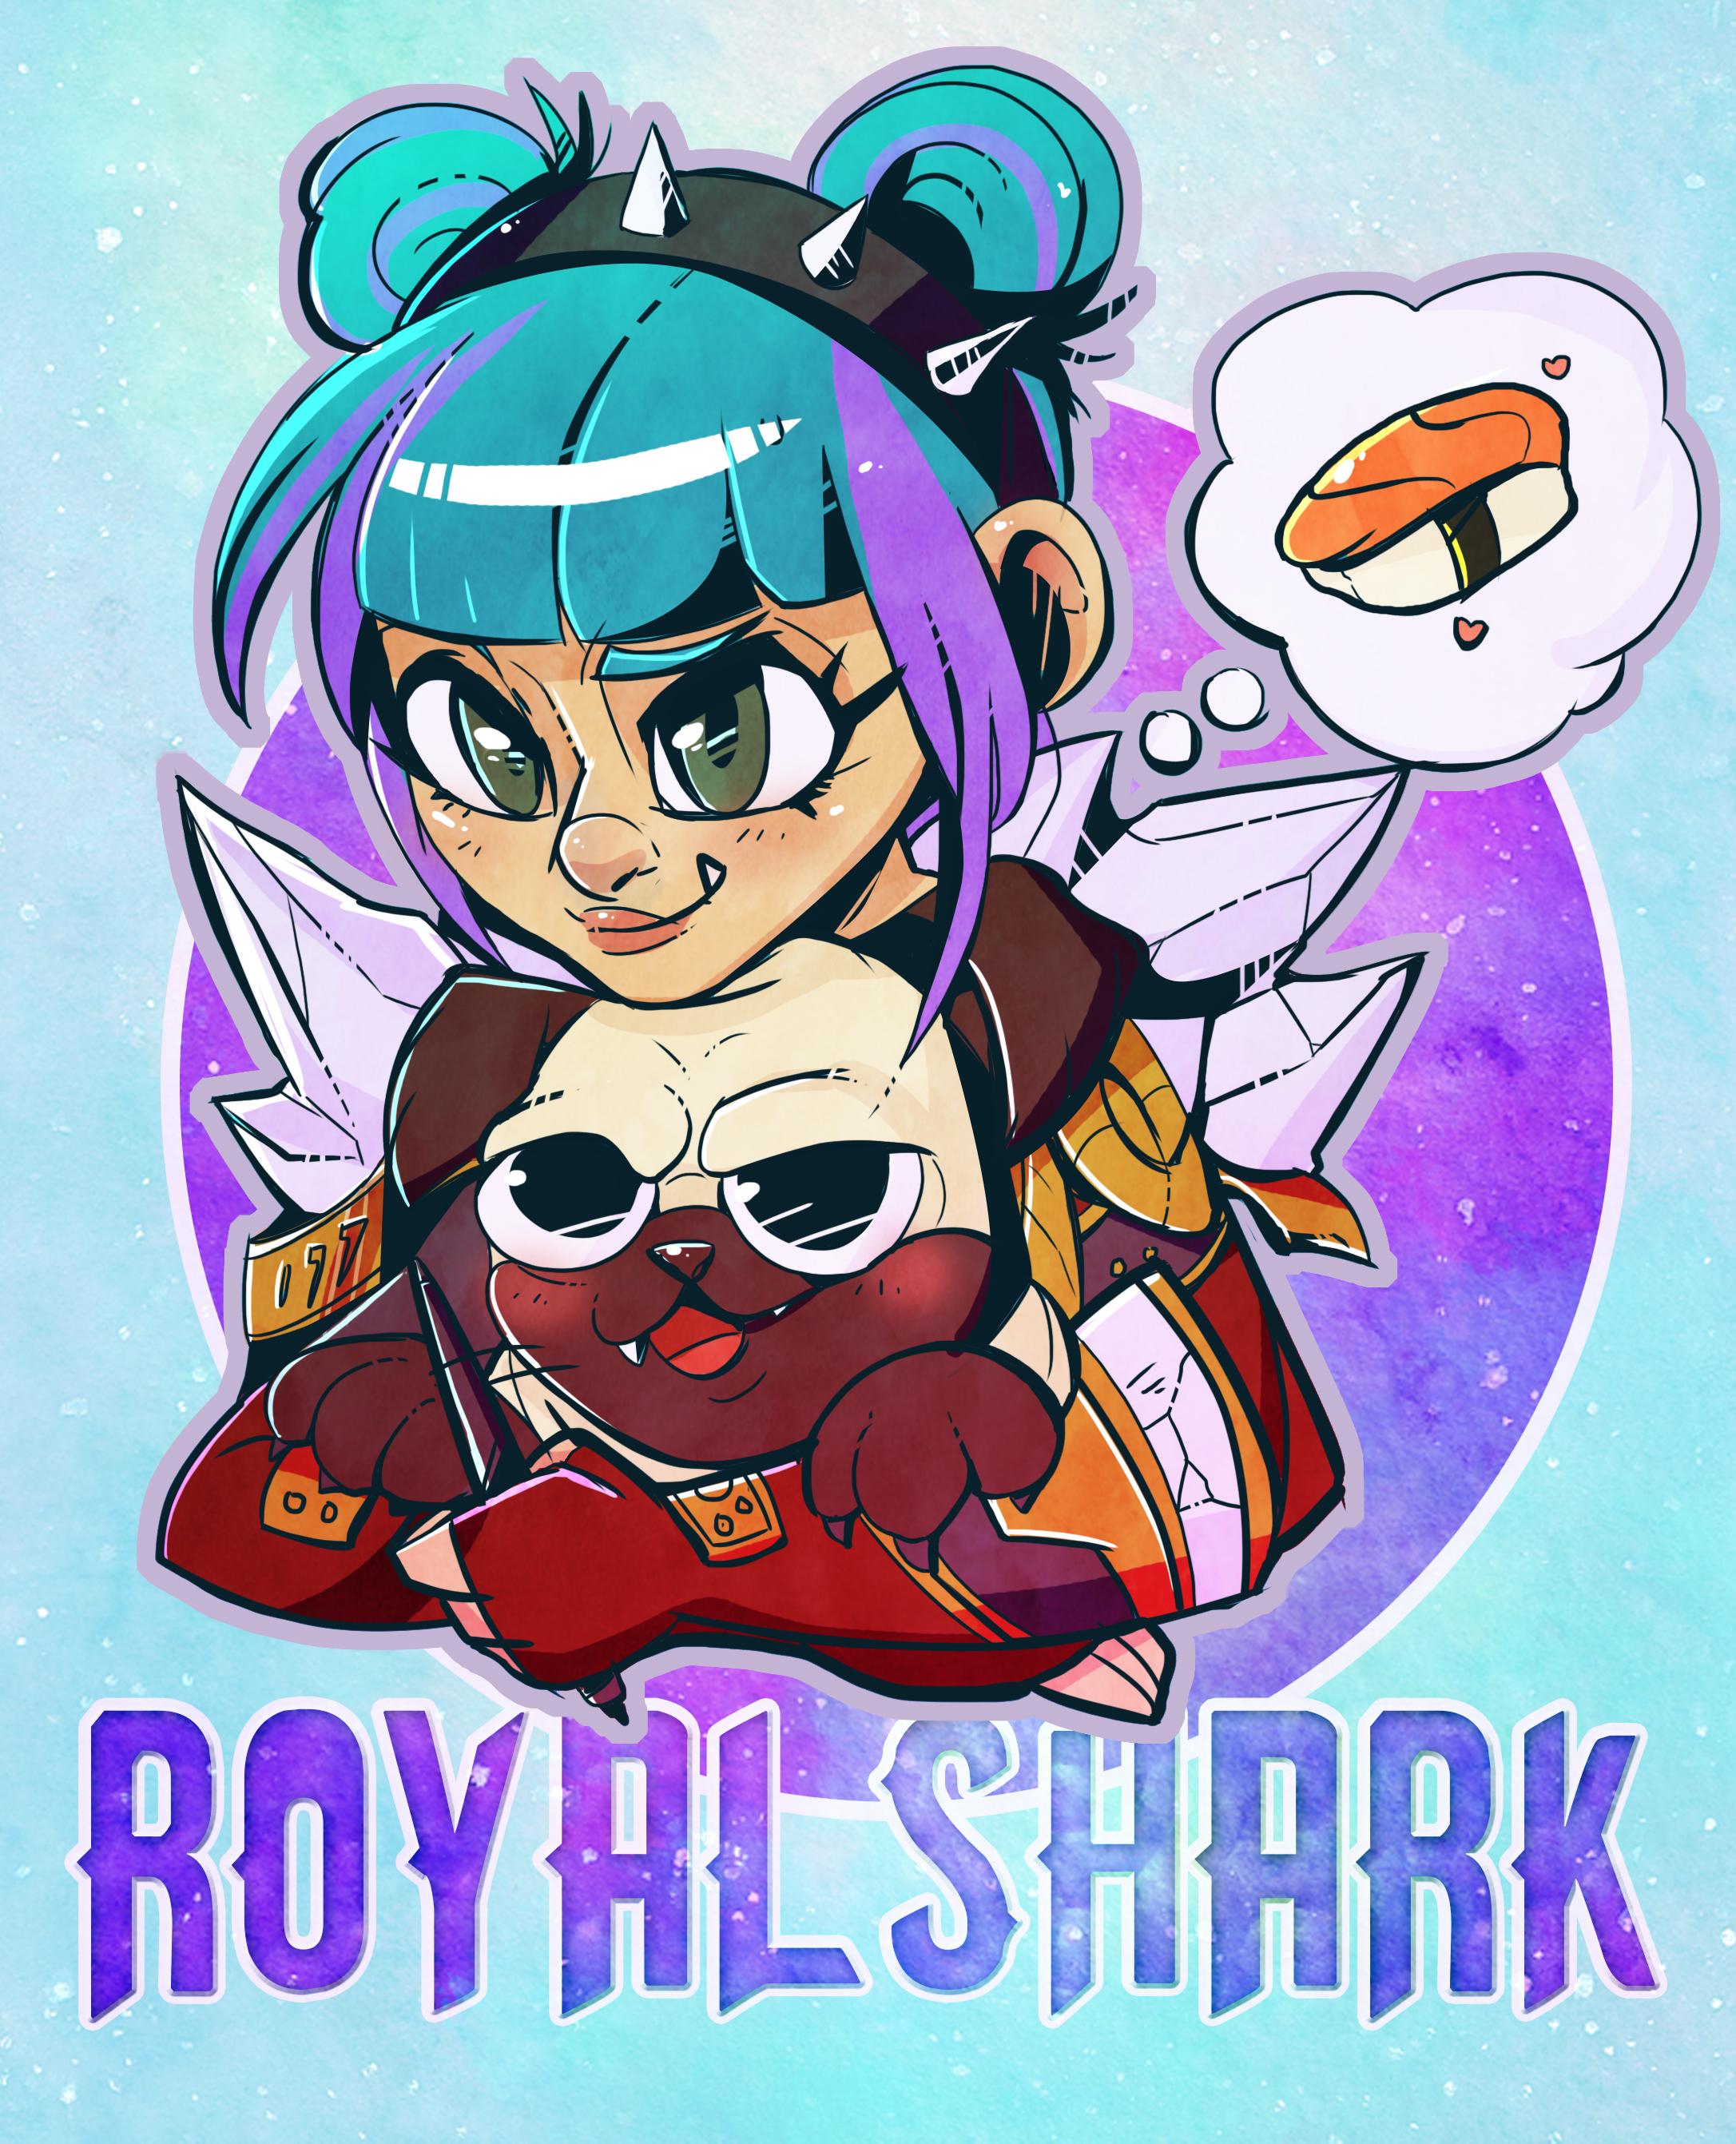 Royal Shark by royalshark